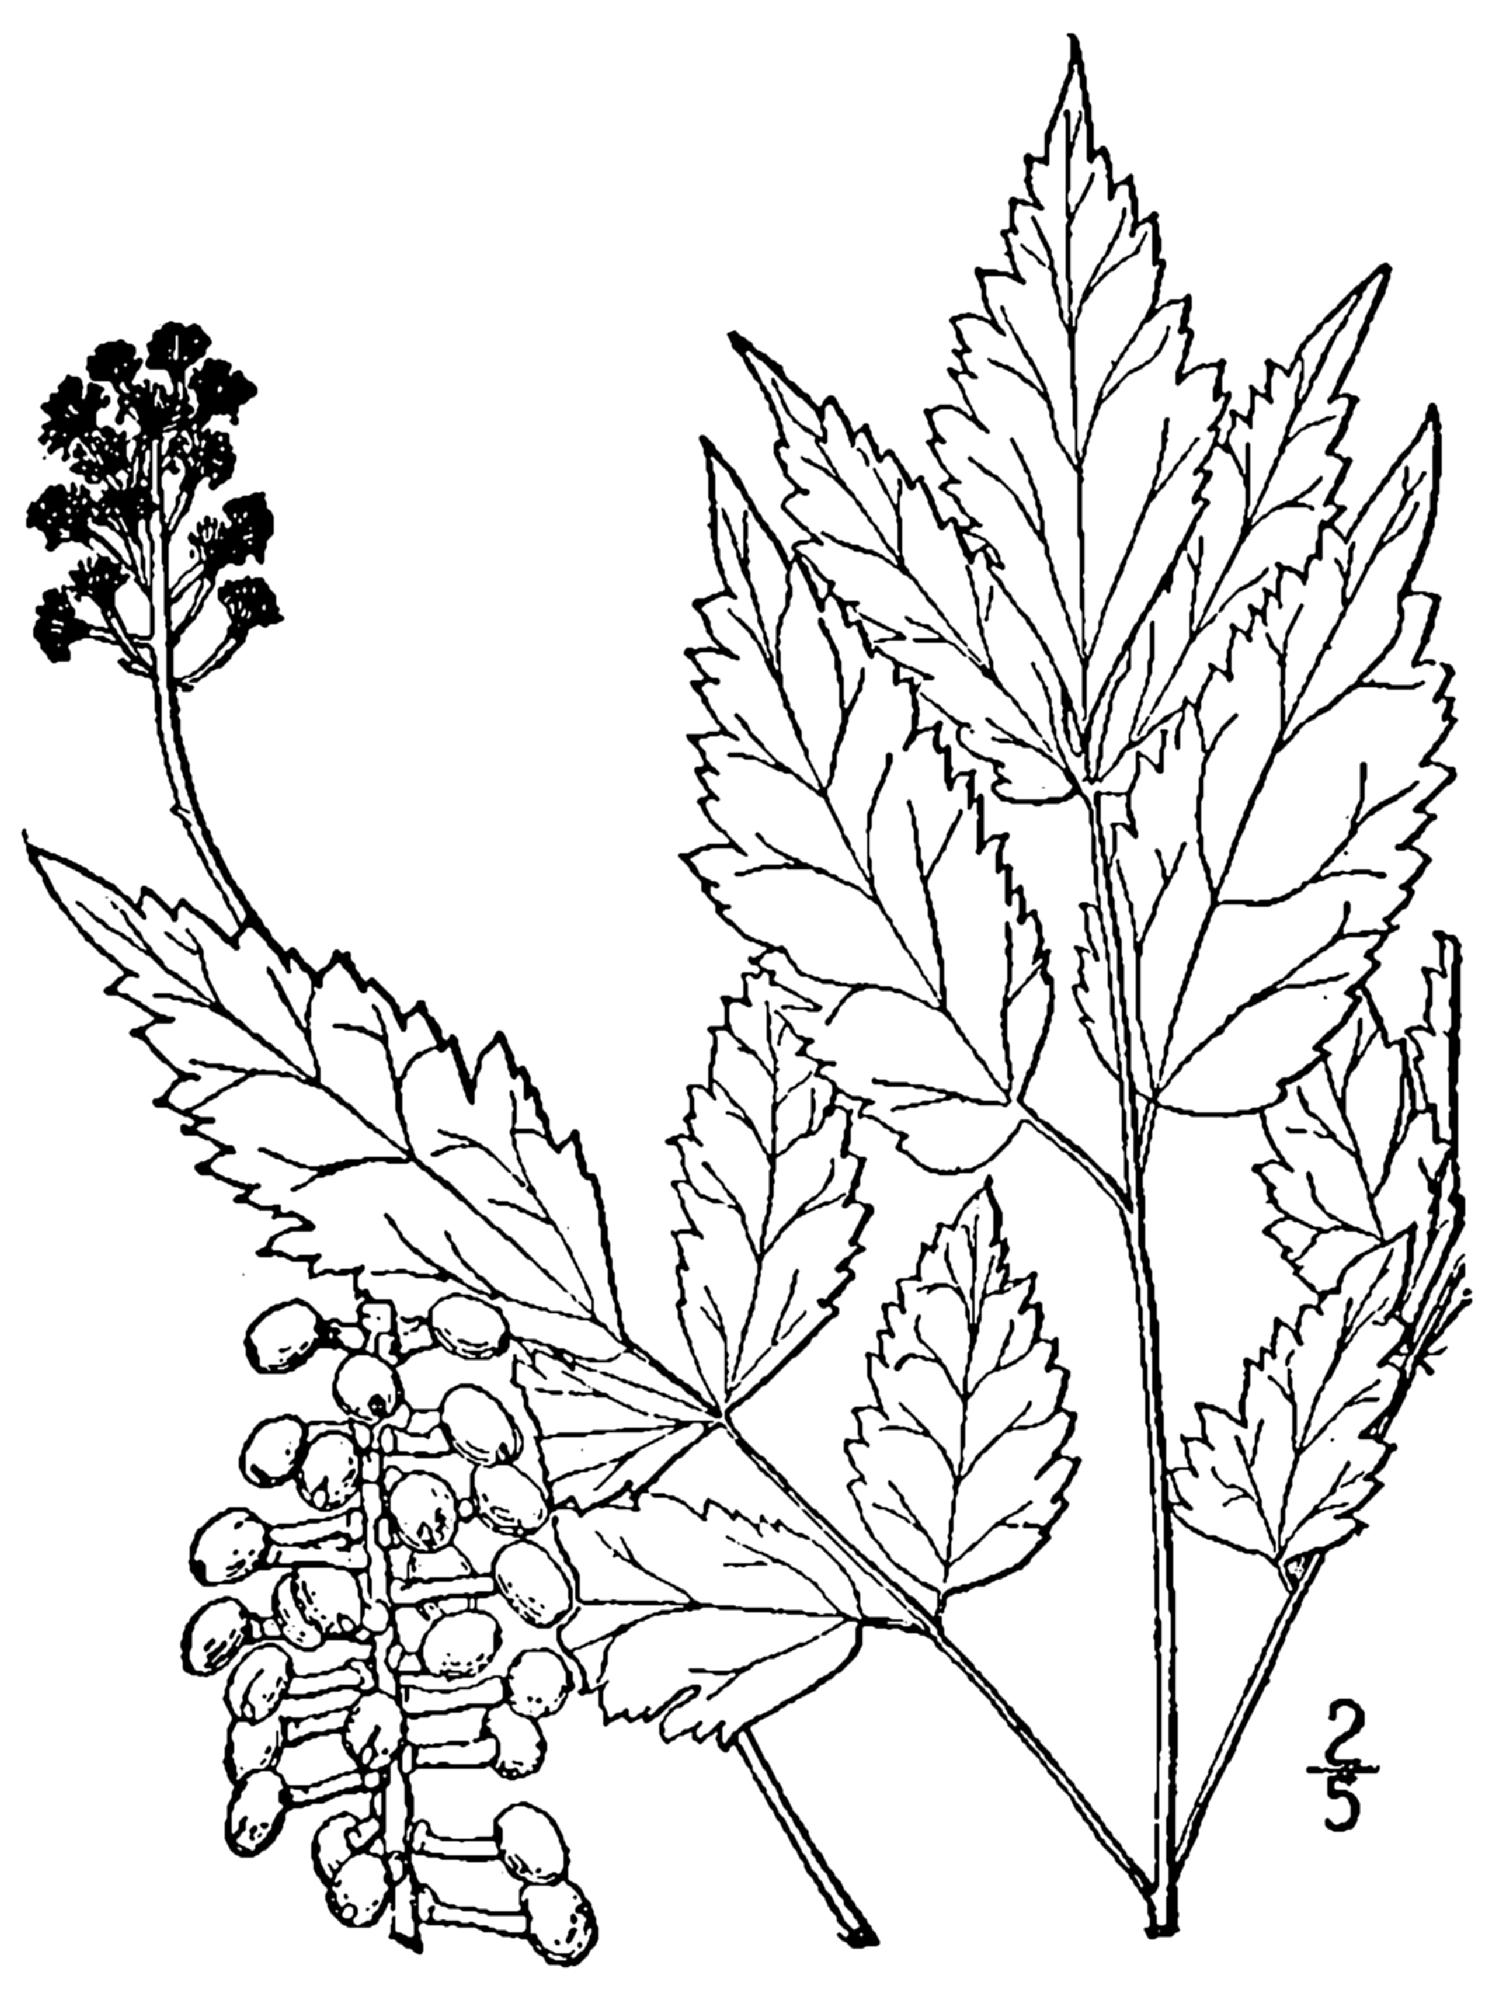 1509x2000 Fileactaea Pachypoda Drawing.png